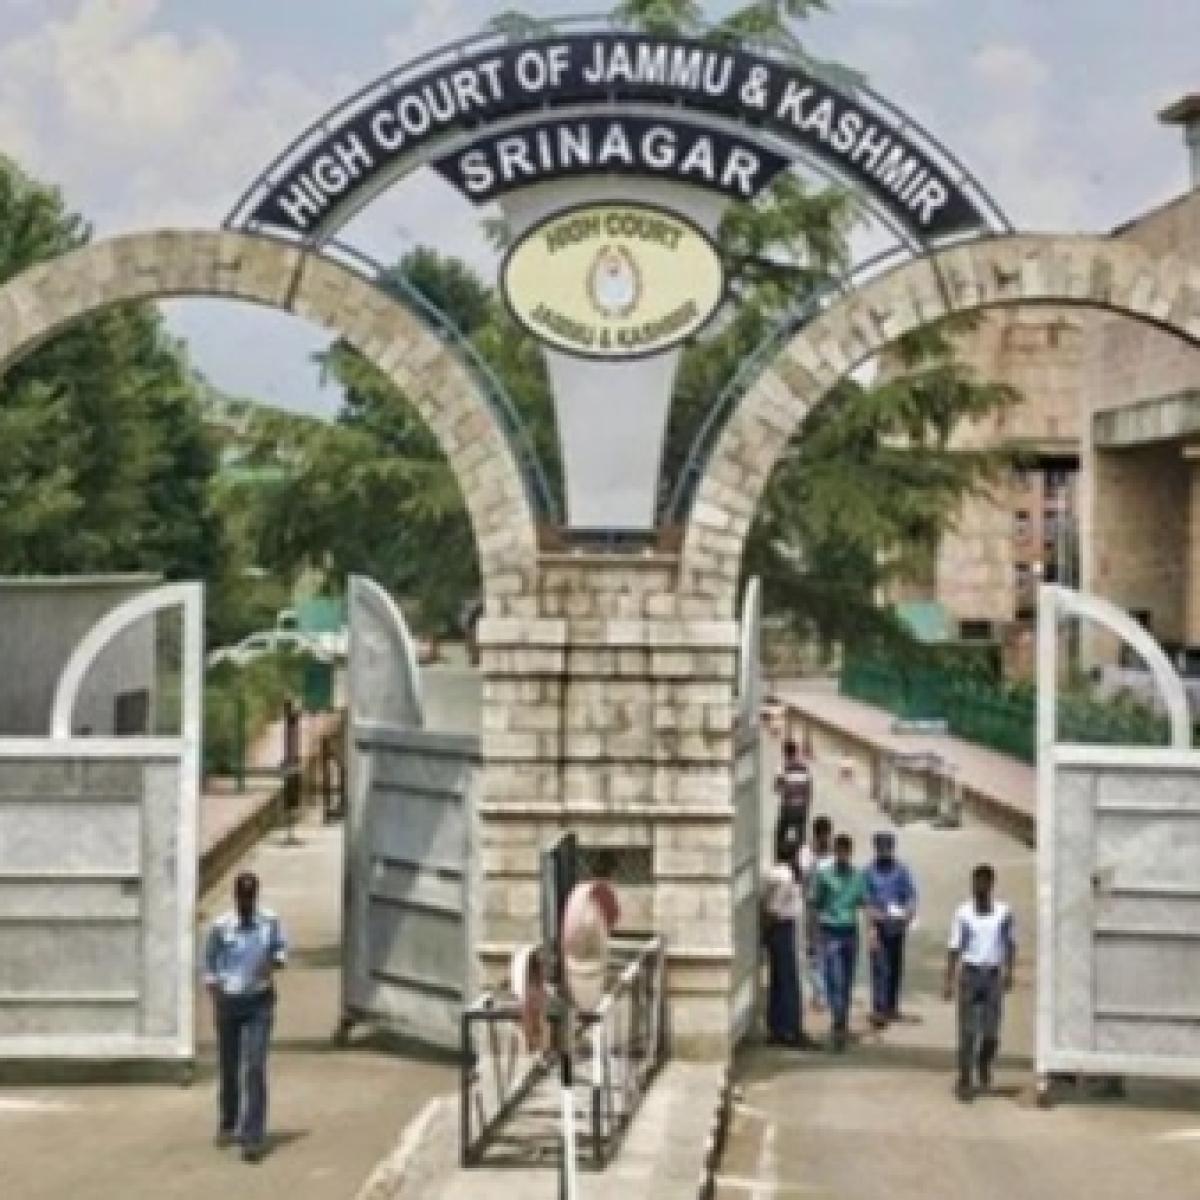 Latest coronavirus update: Jammu and Kashmir HC restricts work till March 31